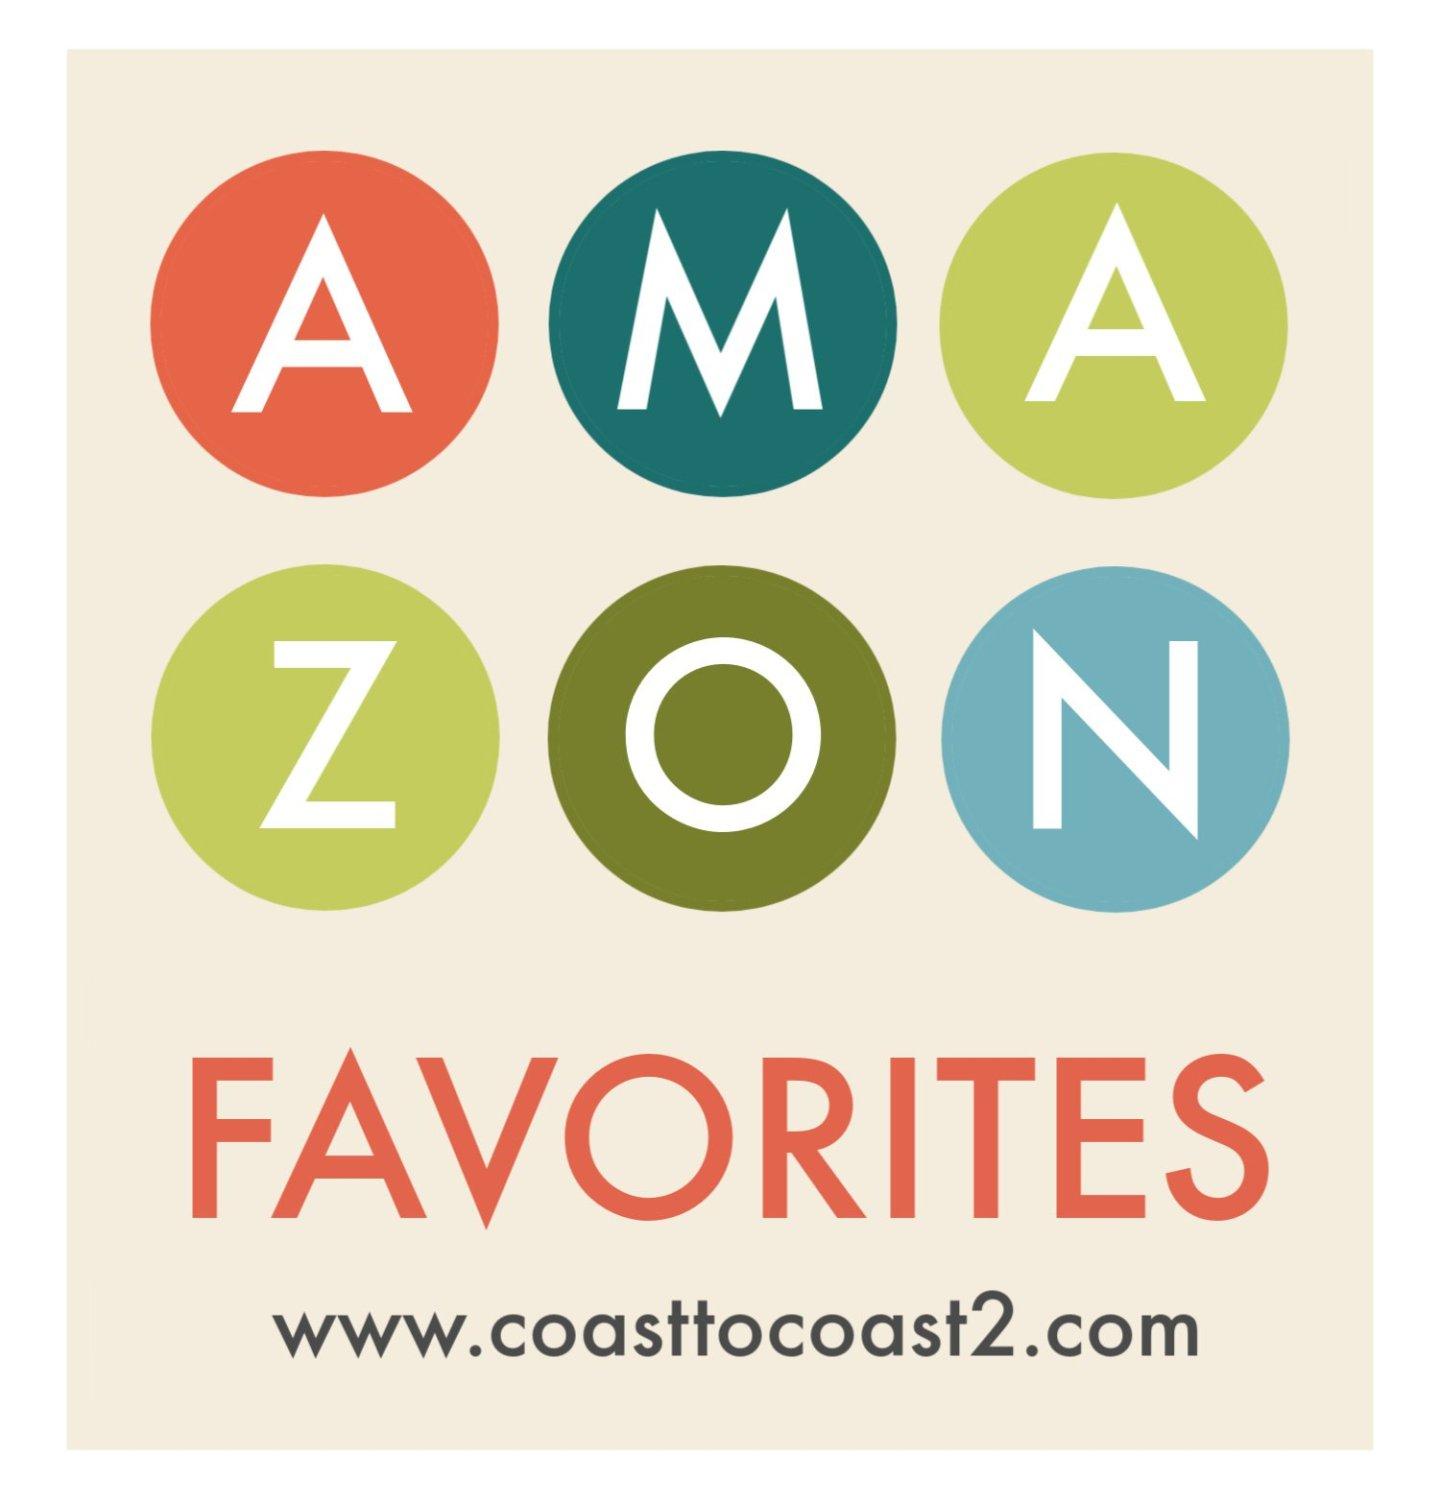 Amazon Favorites #1